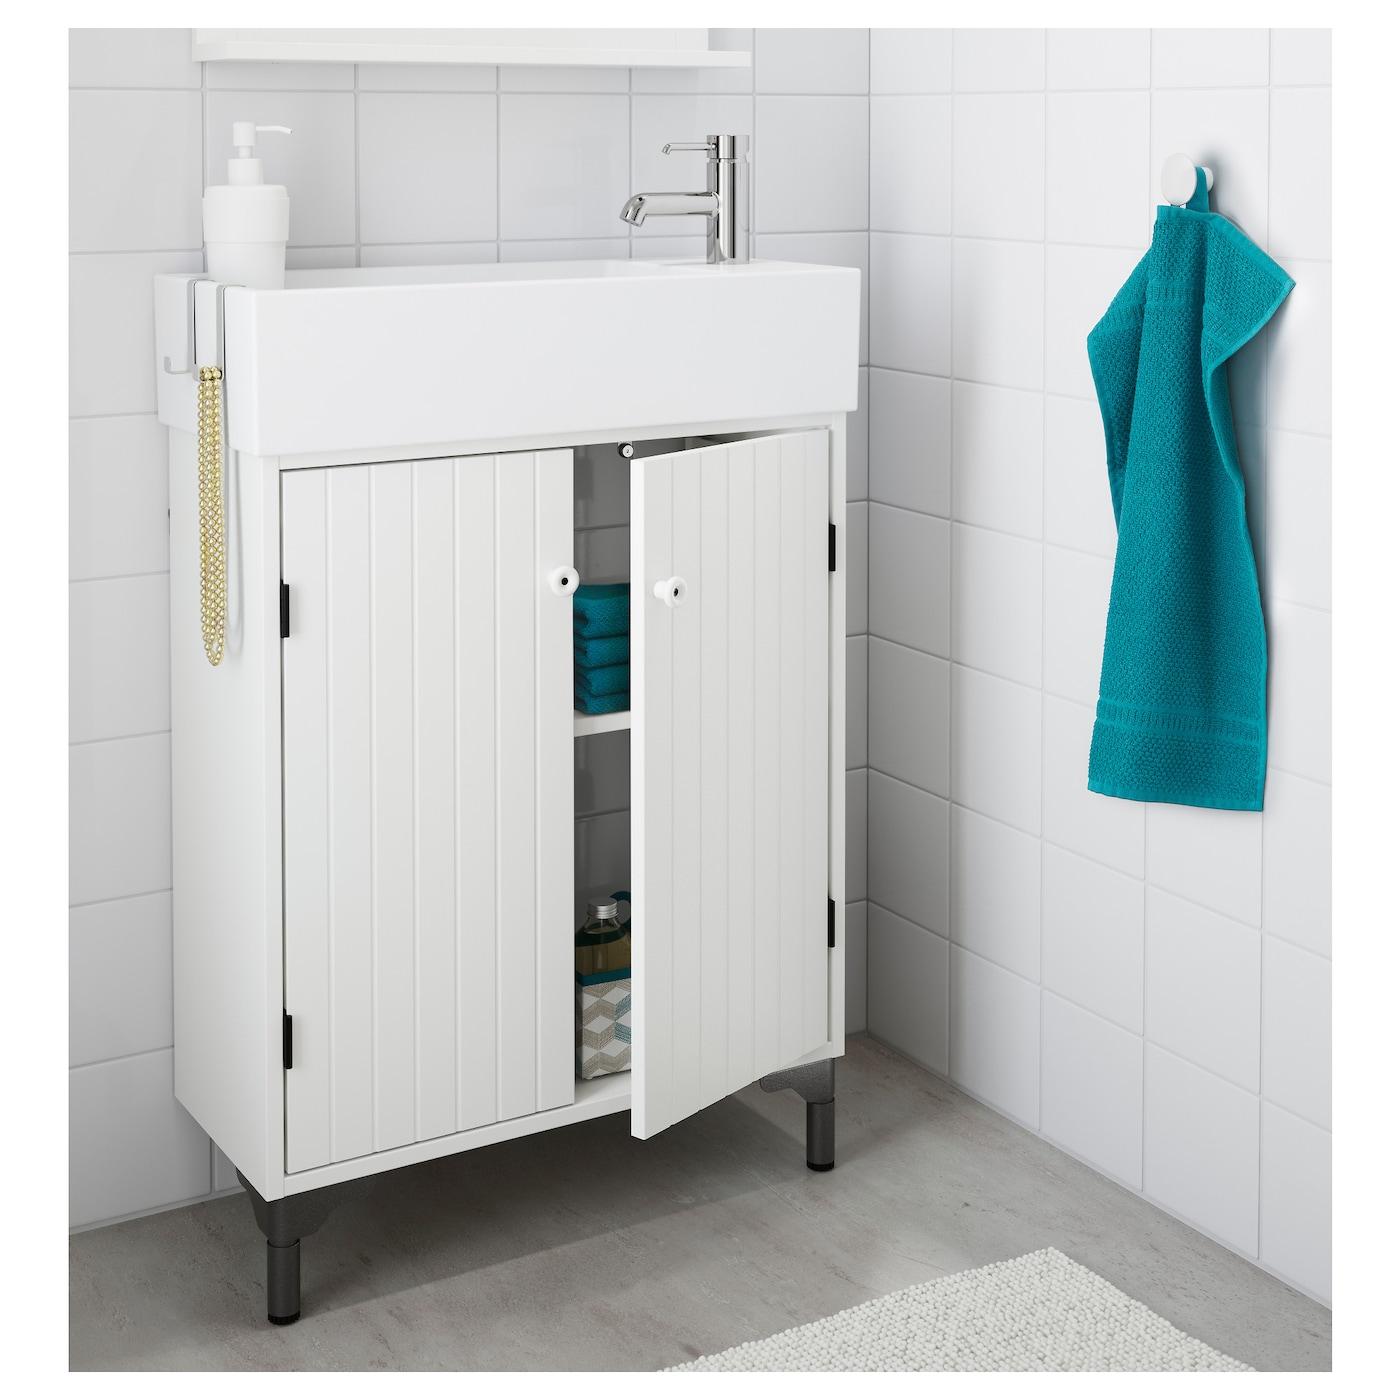 lill ngen silver n l ment lavabo 2 portes blanc 62 x 27 x 94 cm ikea. Black Bedroom Furniture Sets. Home Design Ideas